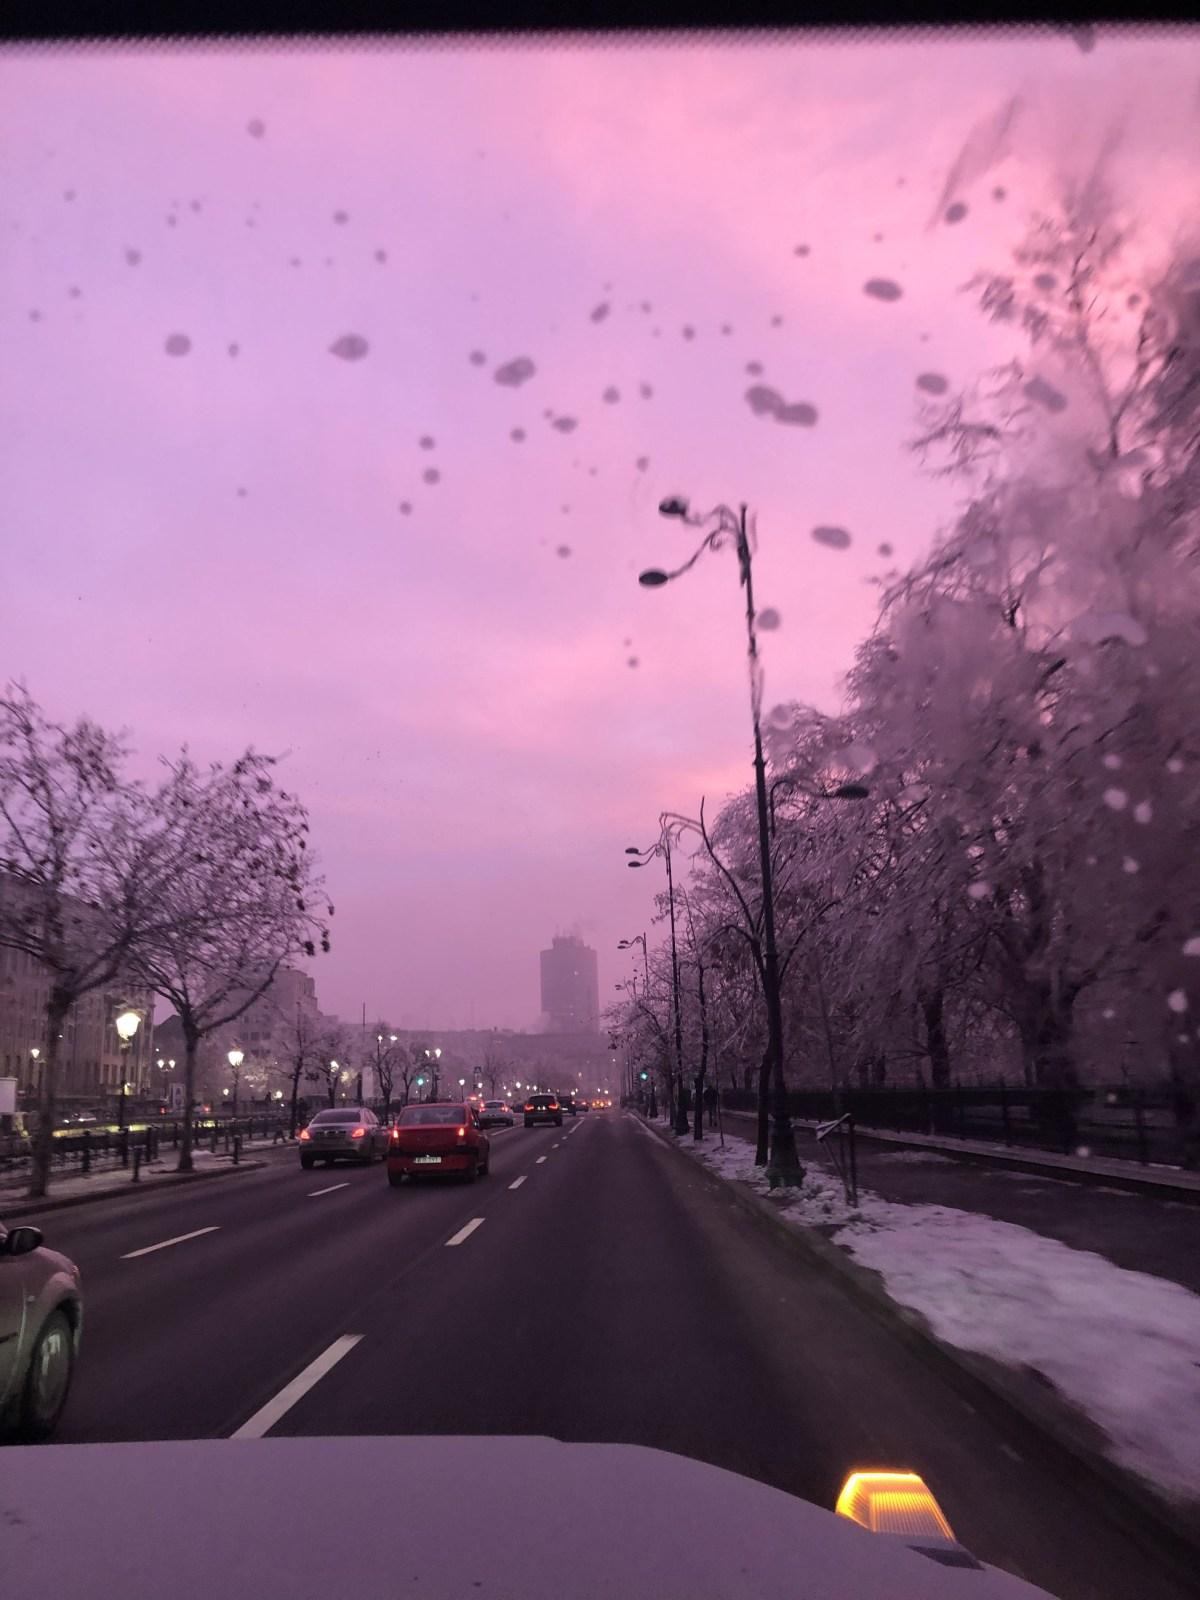 No edit pic (sunrise)